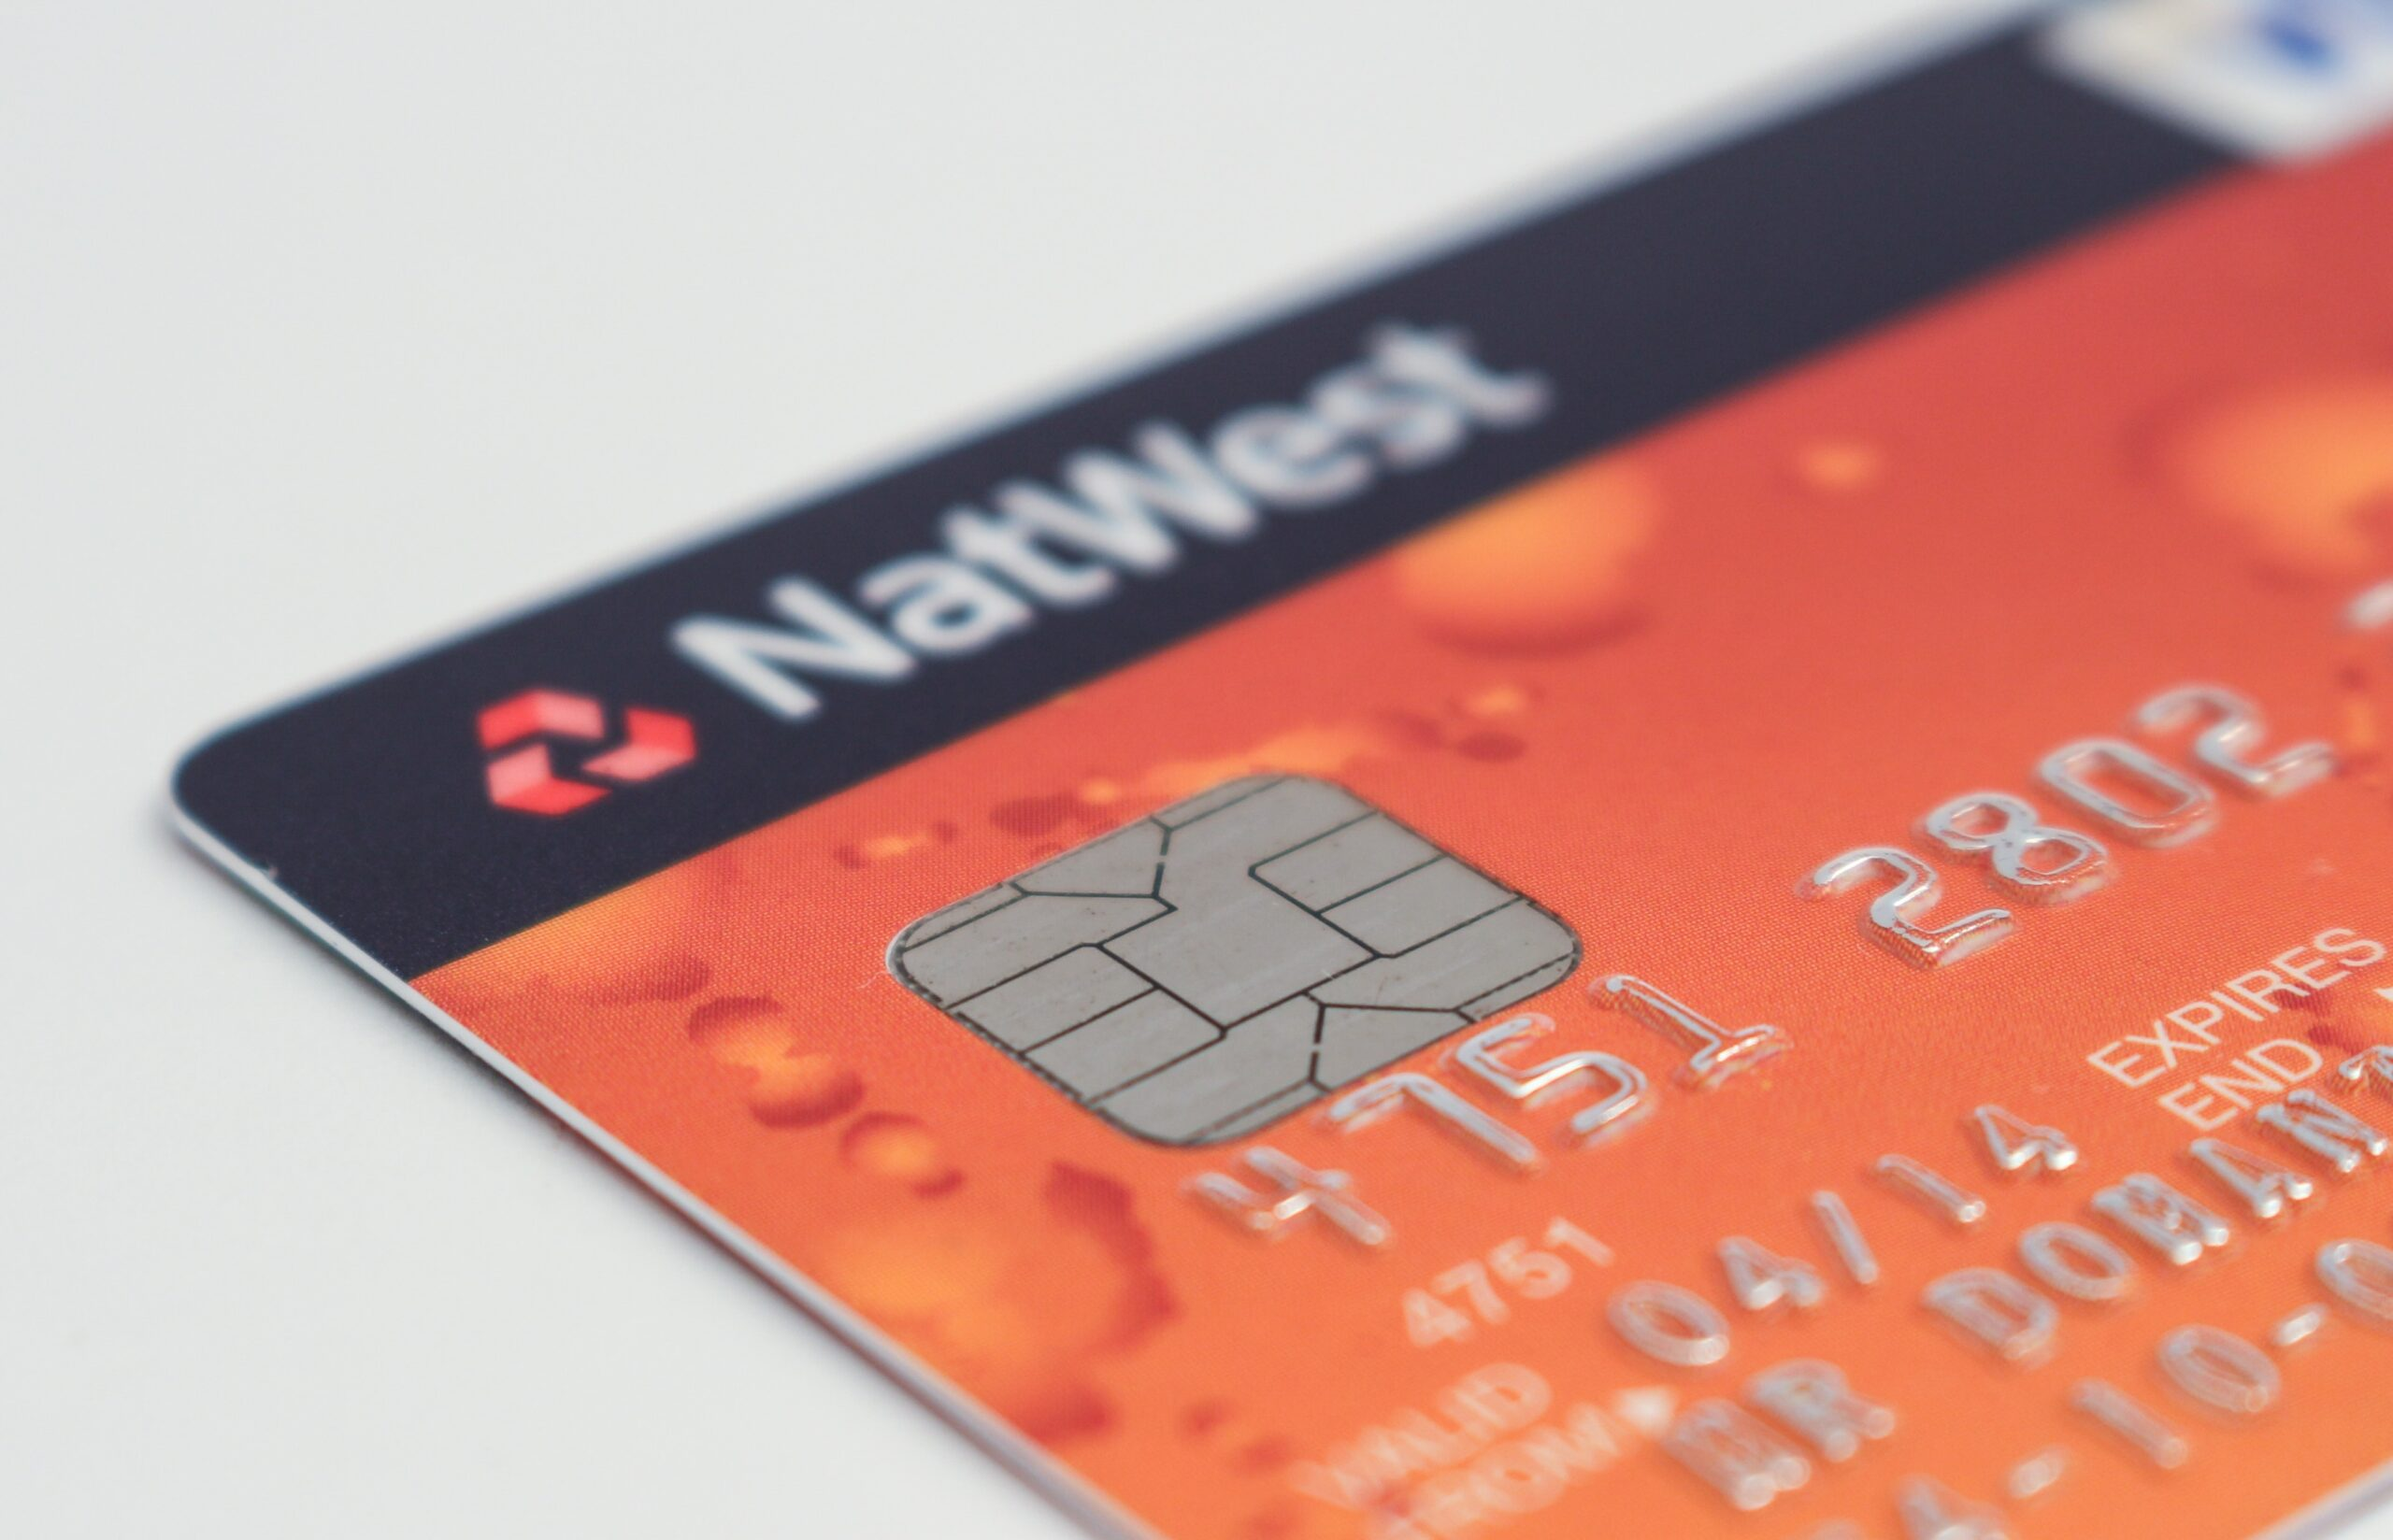 Credit Card chip